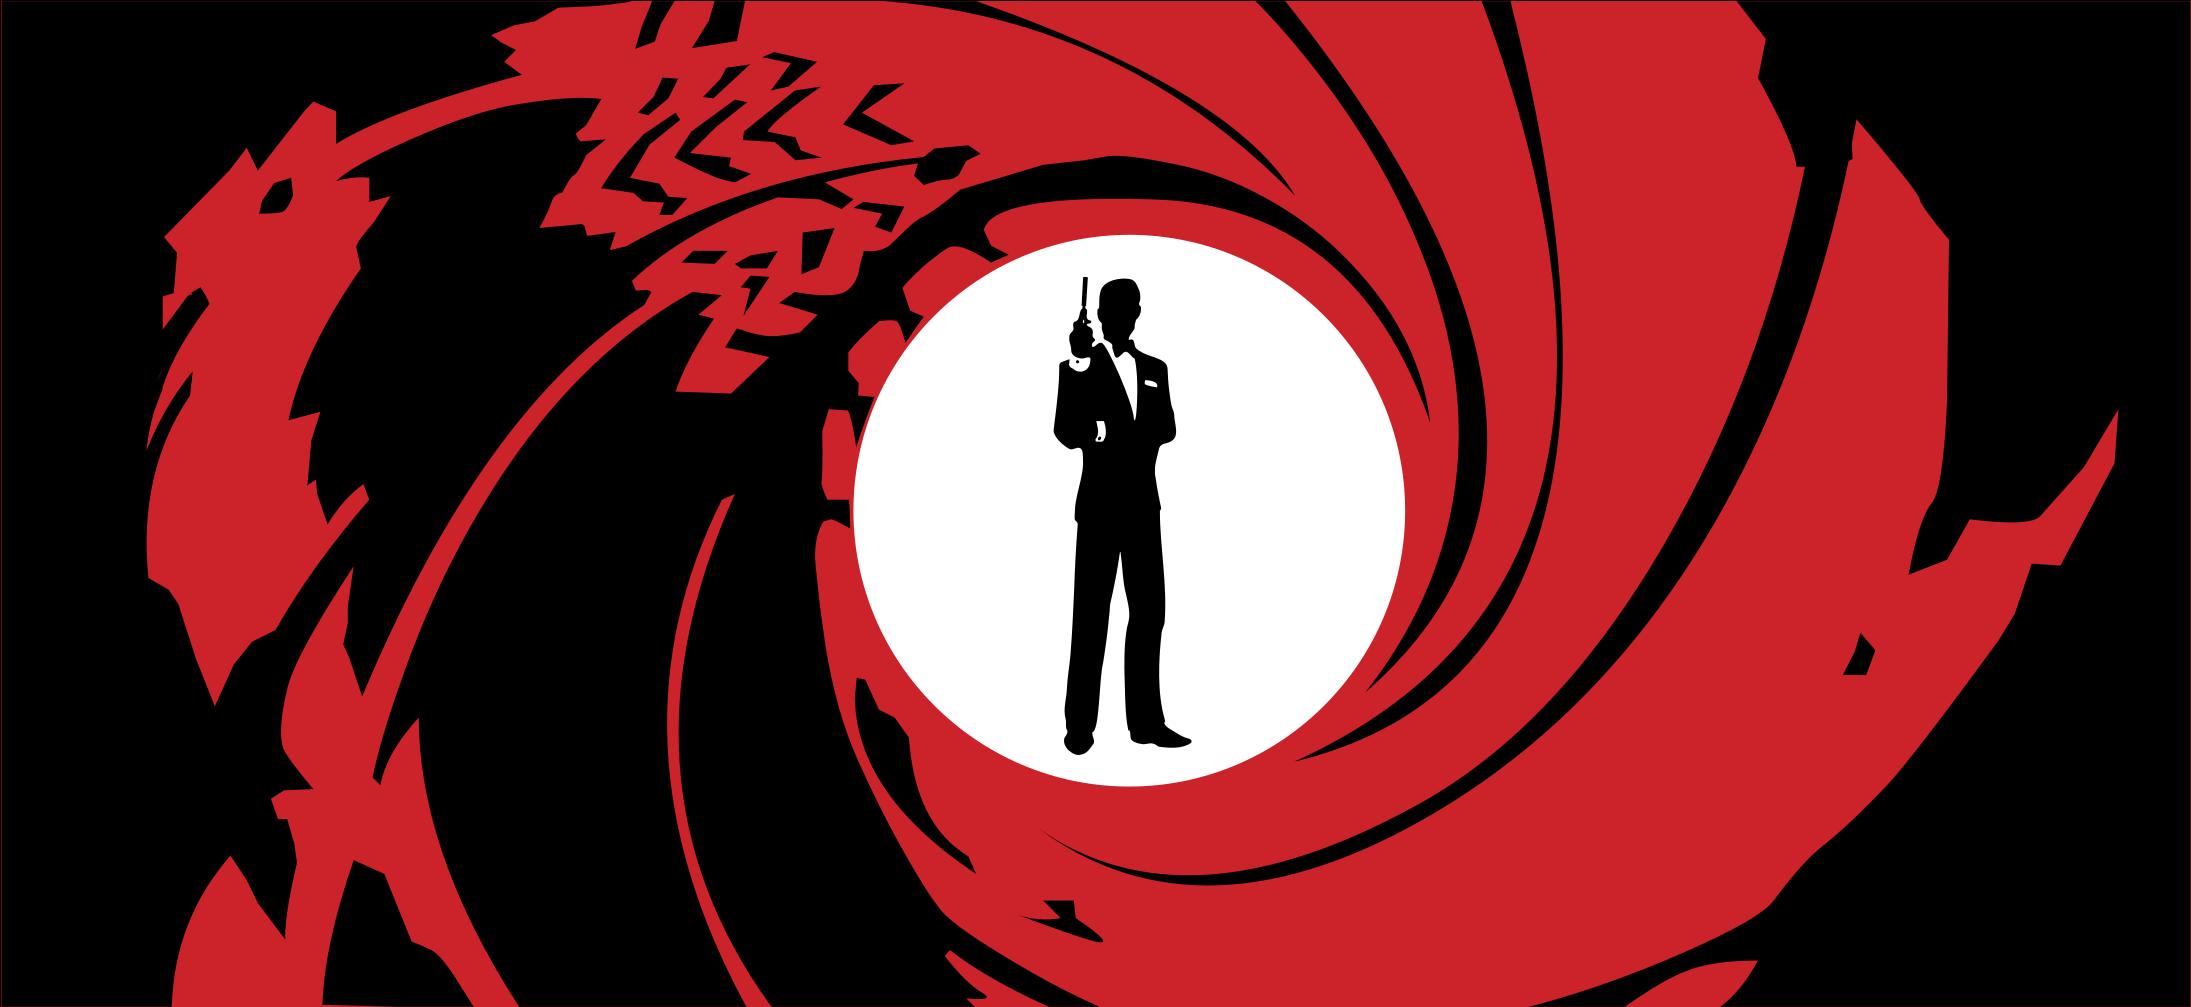 Open Full Size James Bond 007 Logo Png Transparent James Bond Logo Png Download Transparent Png Image And Share Seekpng Wit James Bond Bond James Bond Party